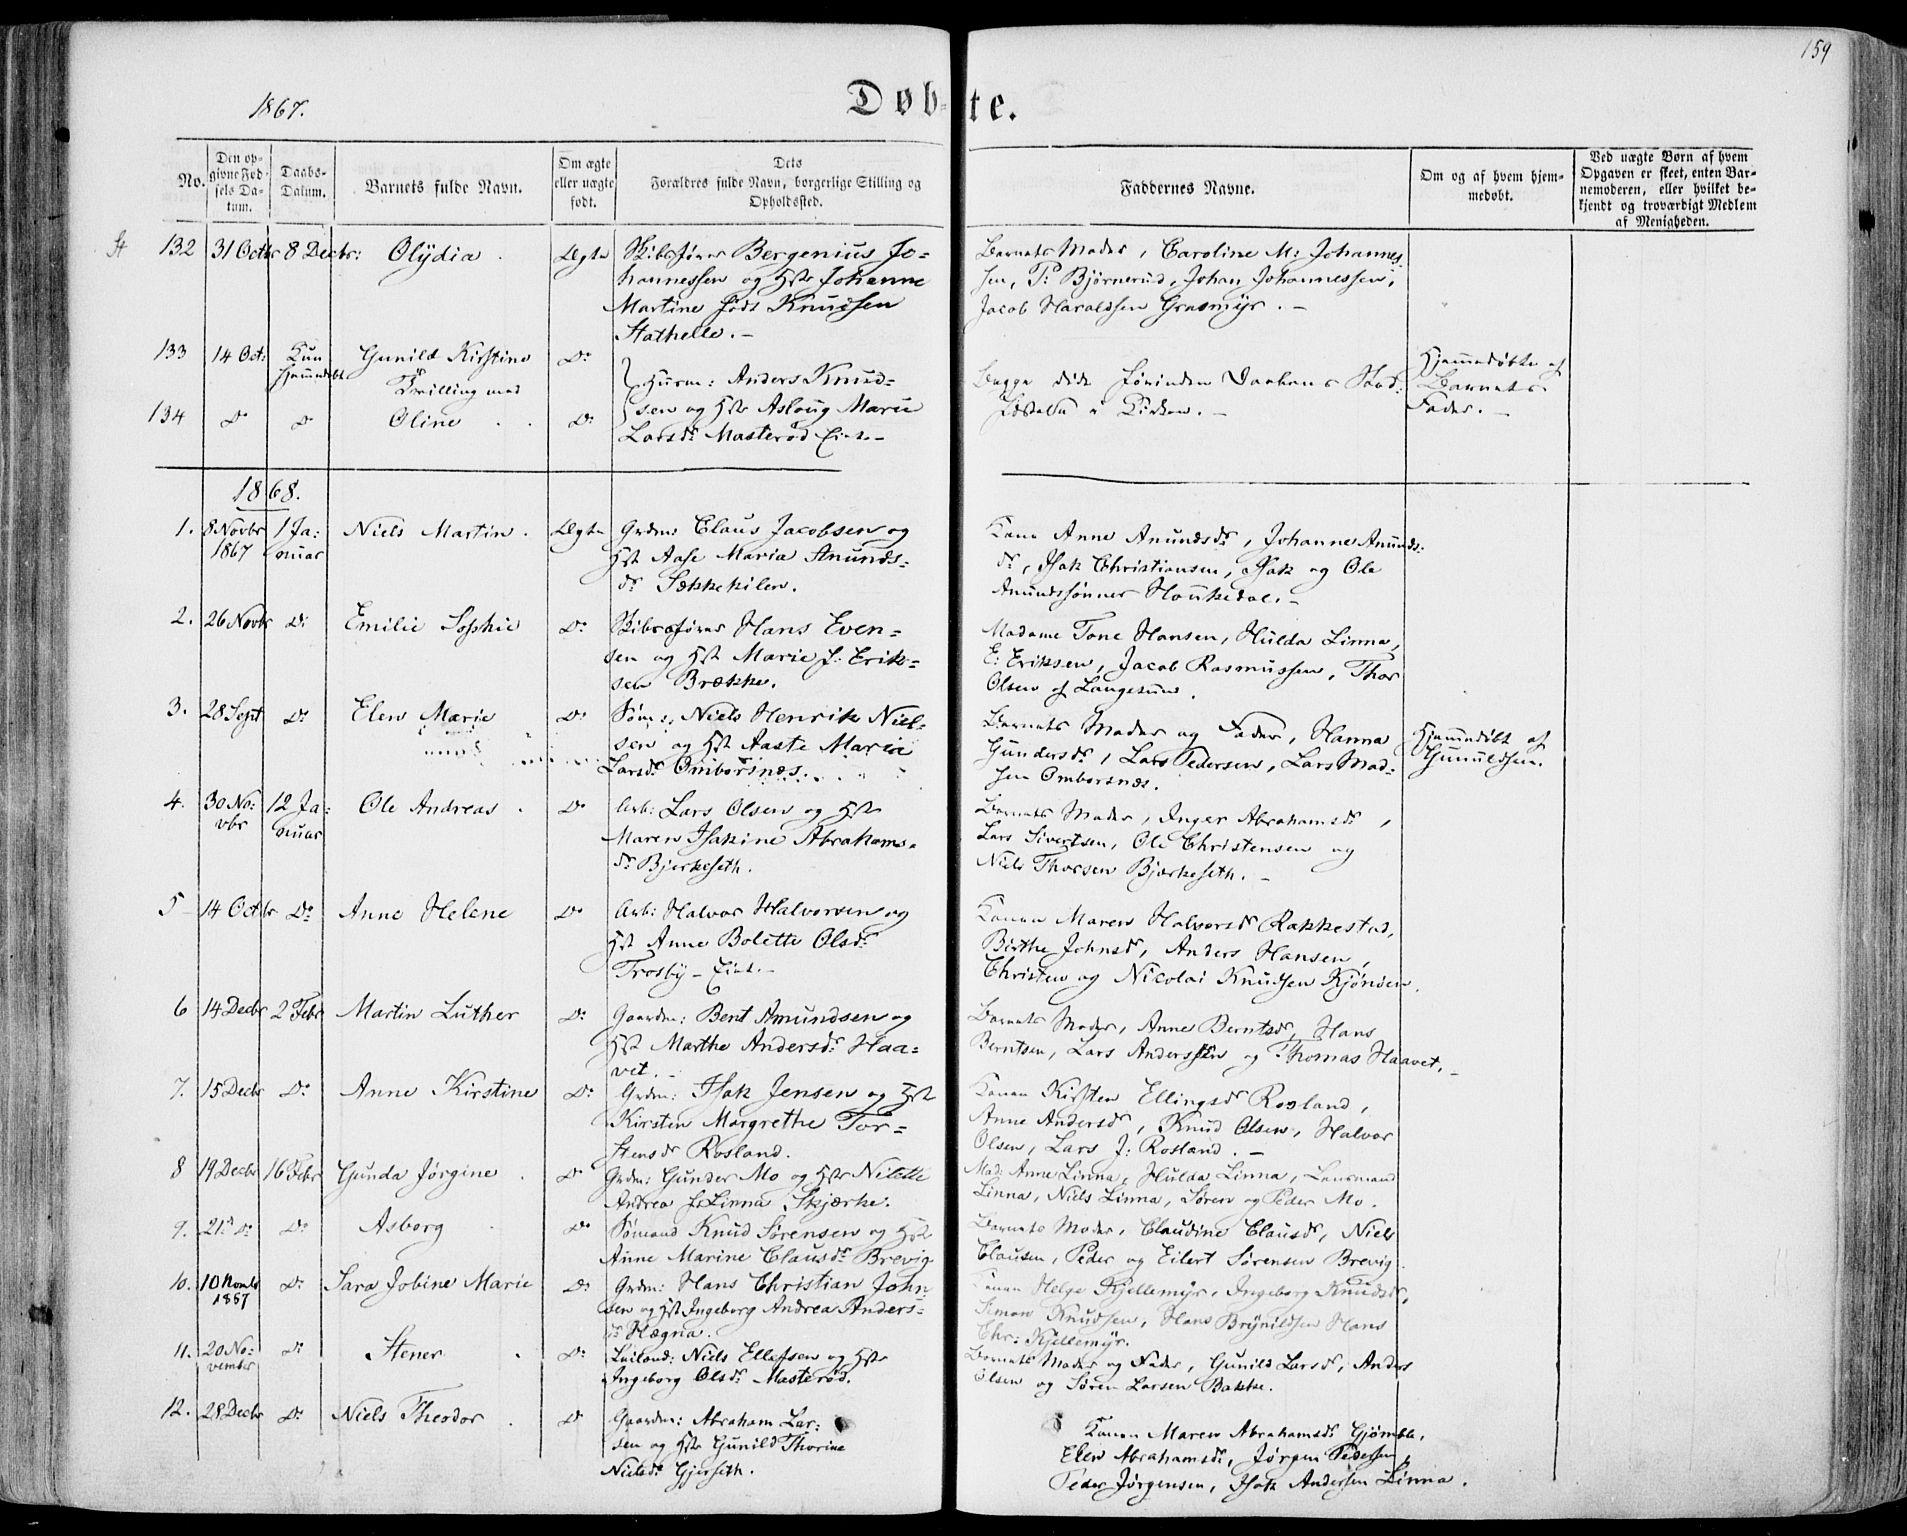 SAKO, Bamble kirkebøker, F/Fa/L0005: Ministerialbok nr. I 5, 1854-1869, s. 159